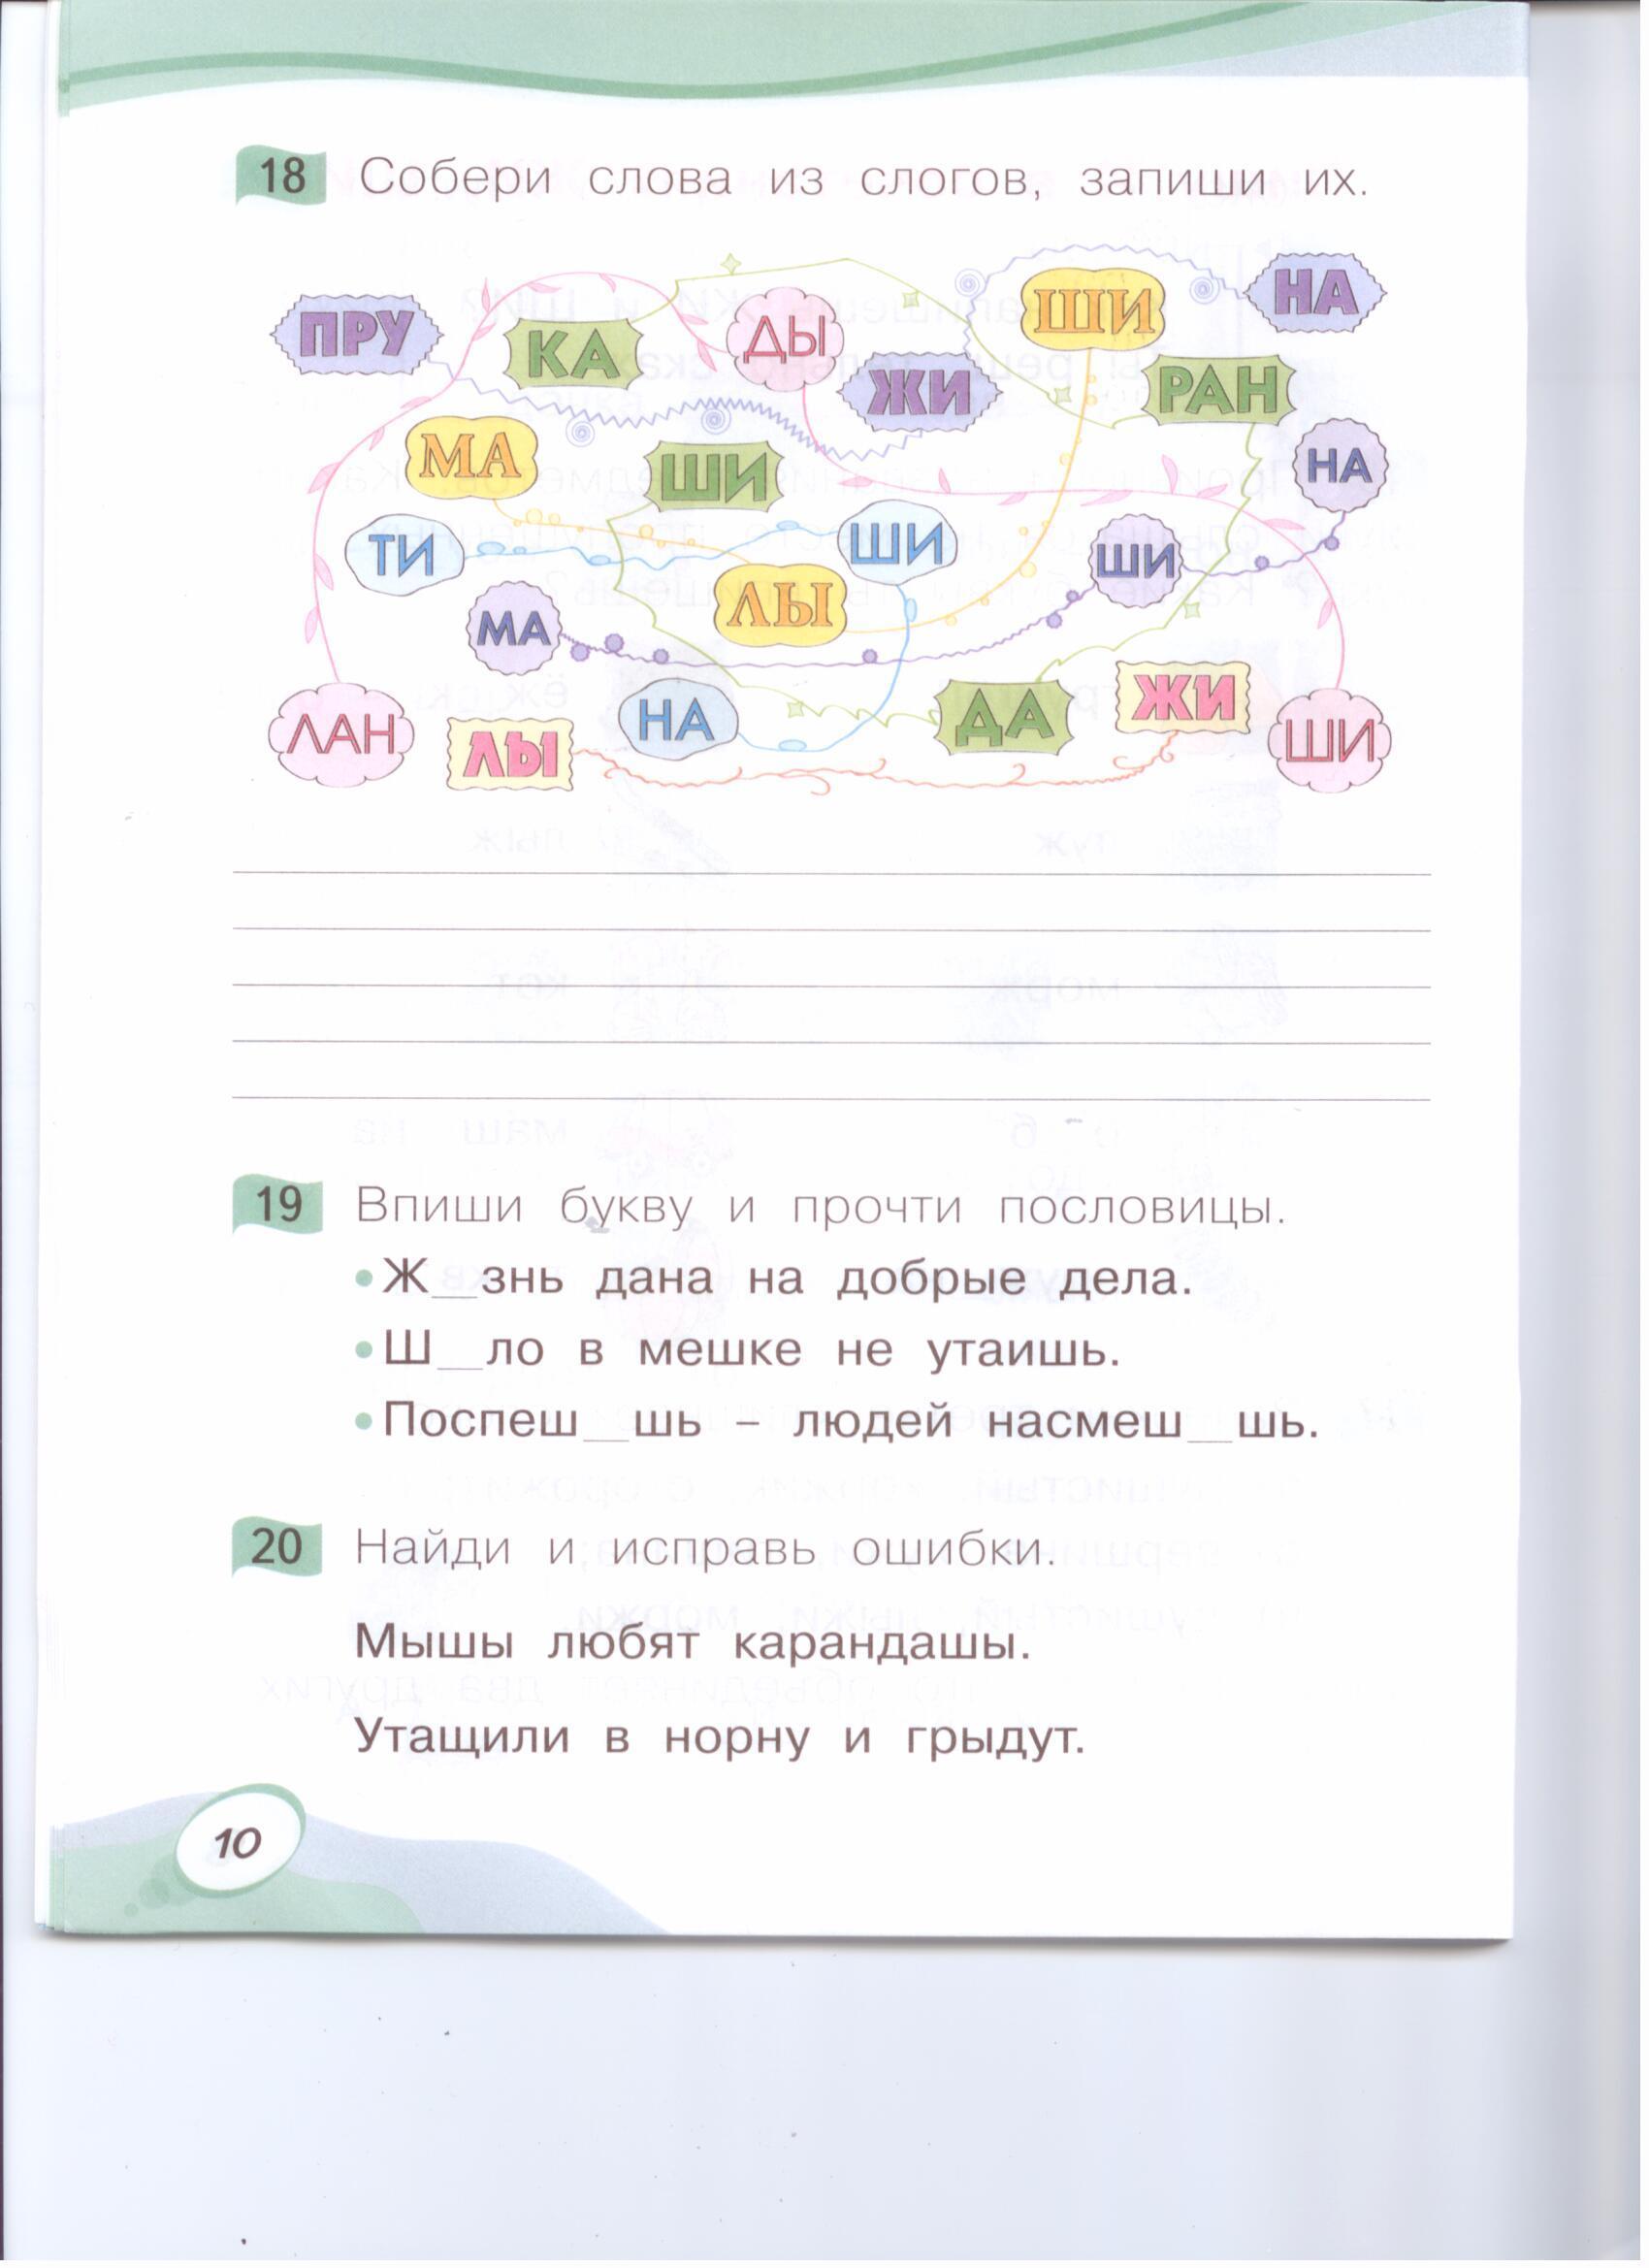 C:\Users\Рангулова\Pictures\2015-12-21 1\1 003.jpg